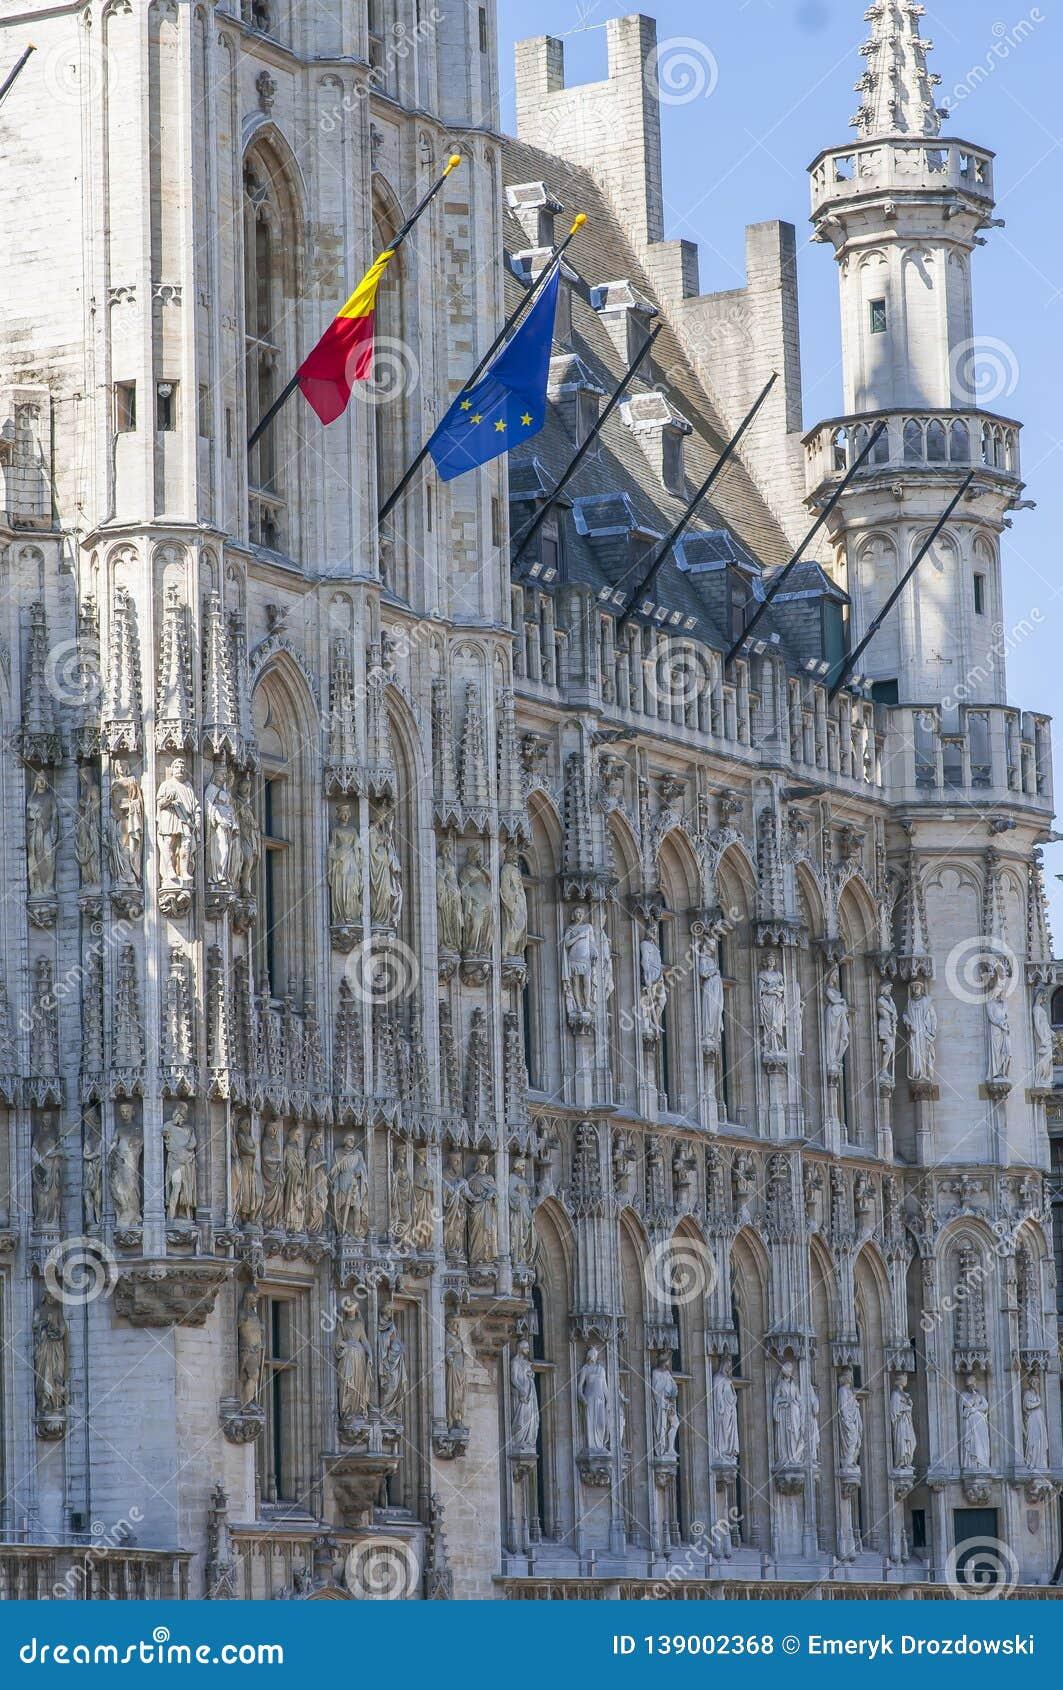 Meet girls in Bruxelles   Dating site   Topface